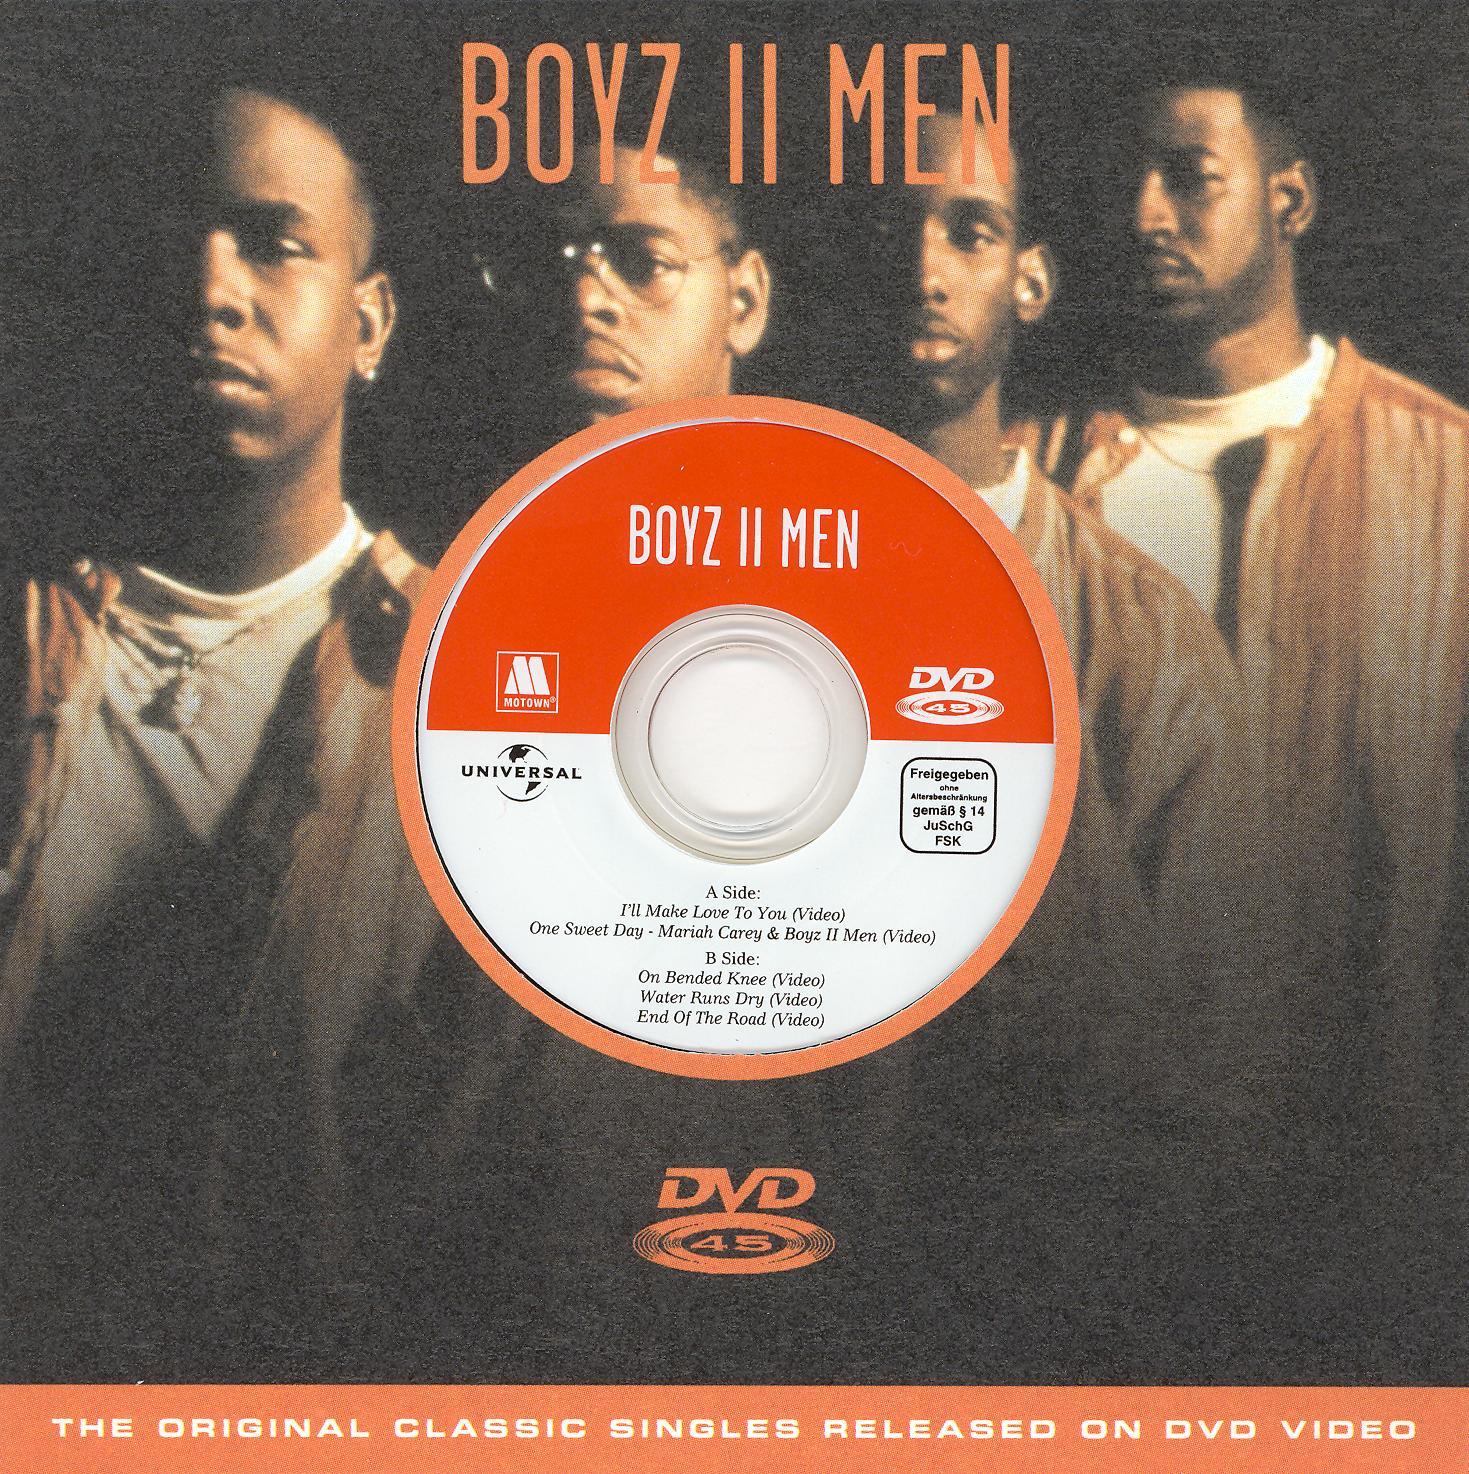 Boyz II Men: I'll Make Love to You